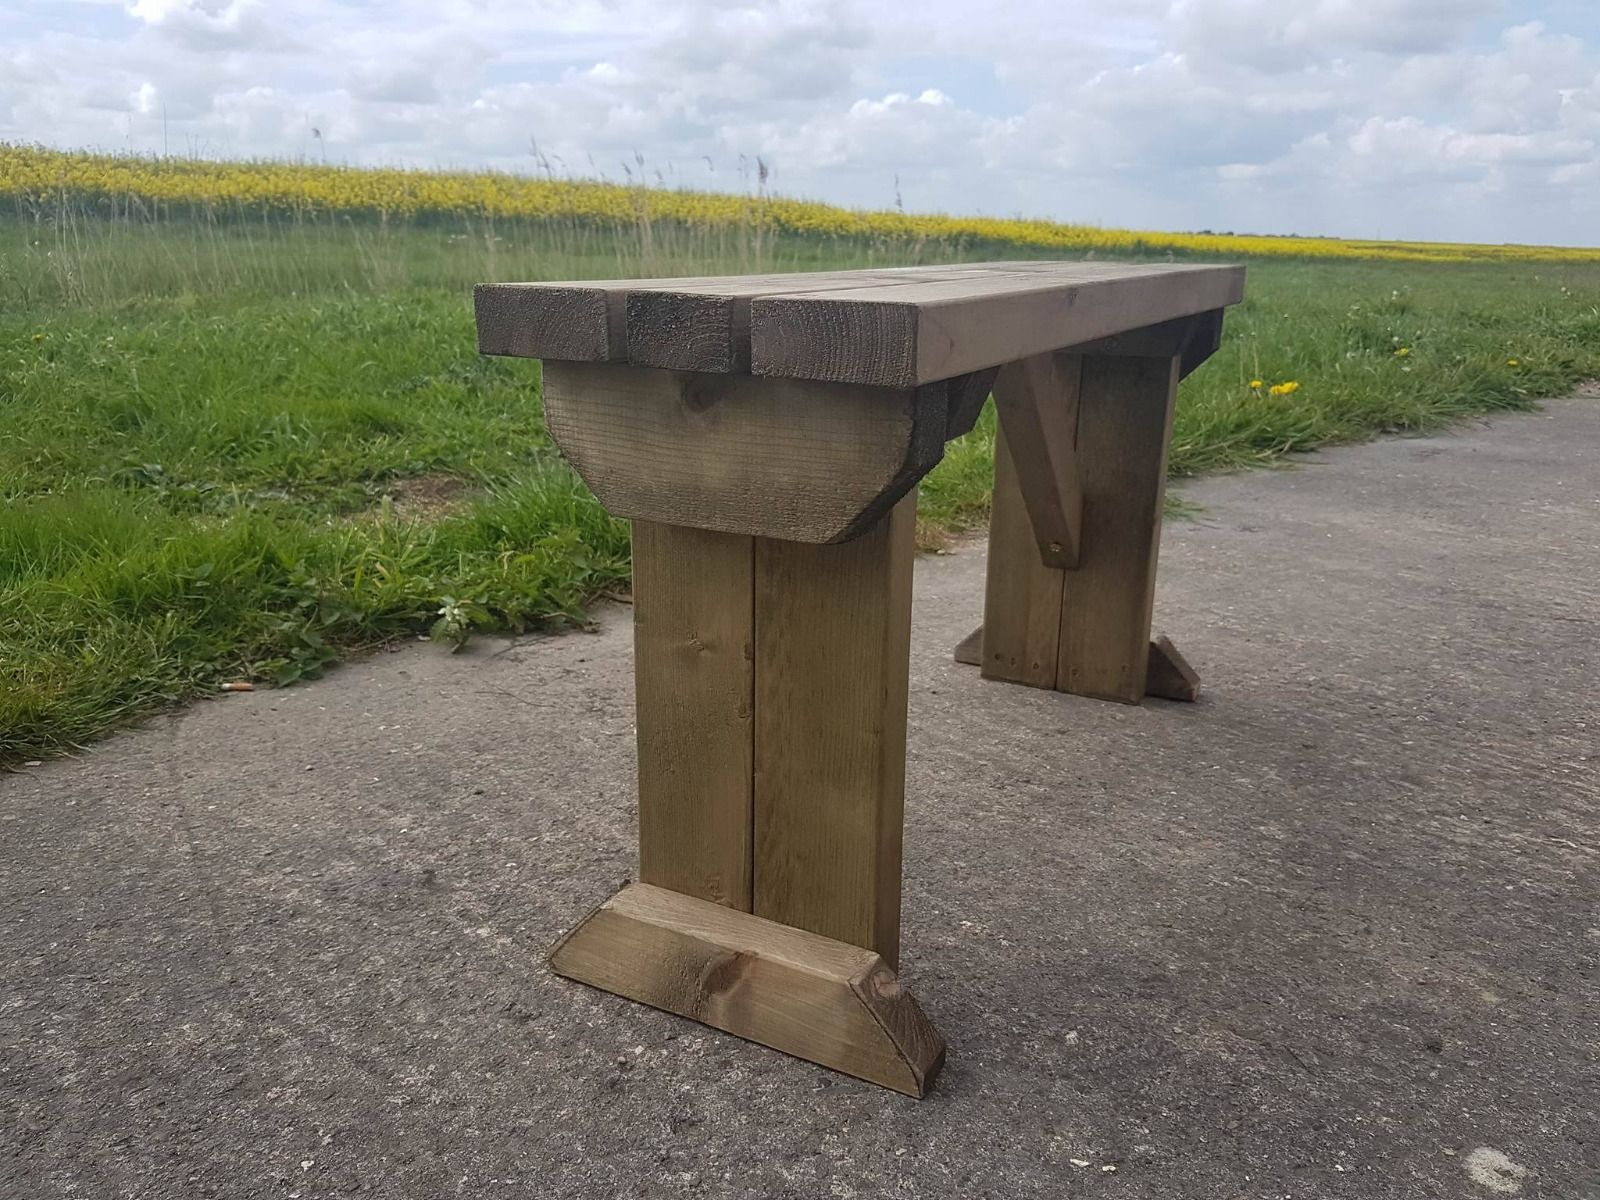 Picnic Bench Hollies Wooden Outdoor Garden Furniture Fence ...